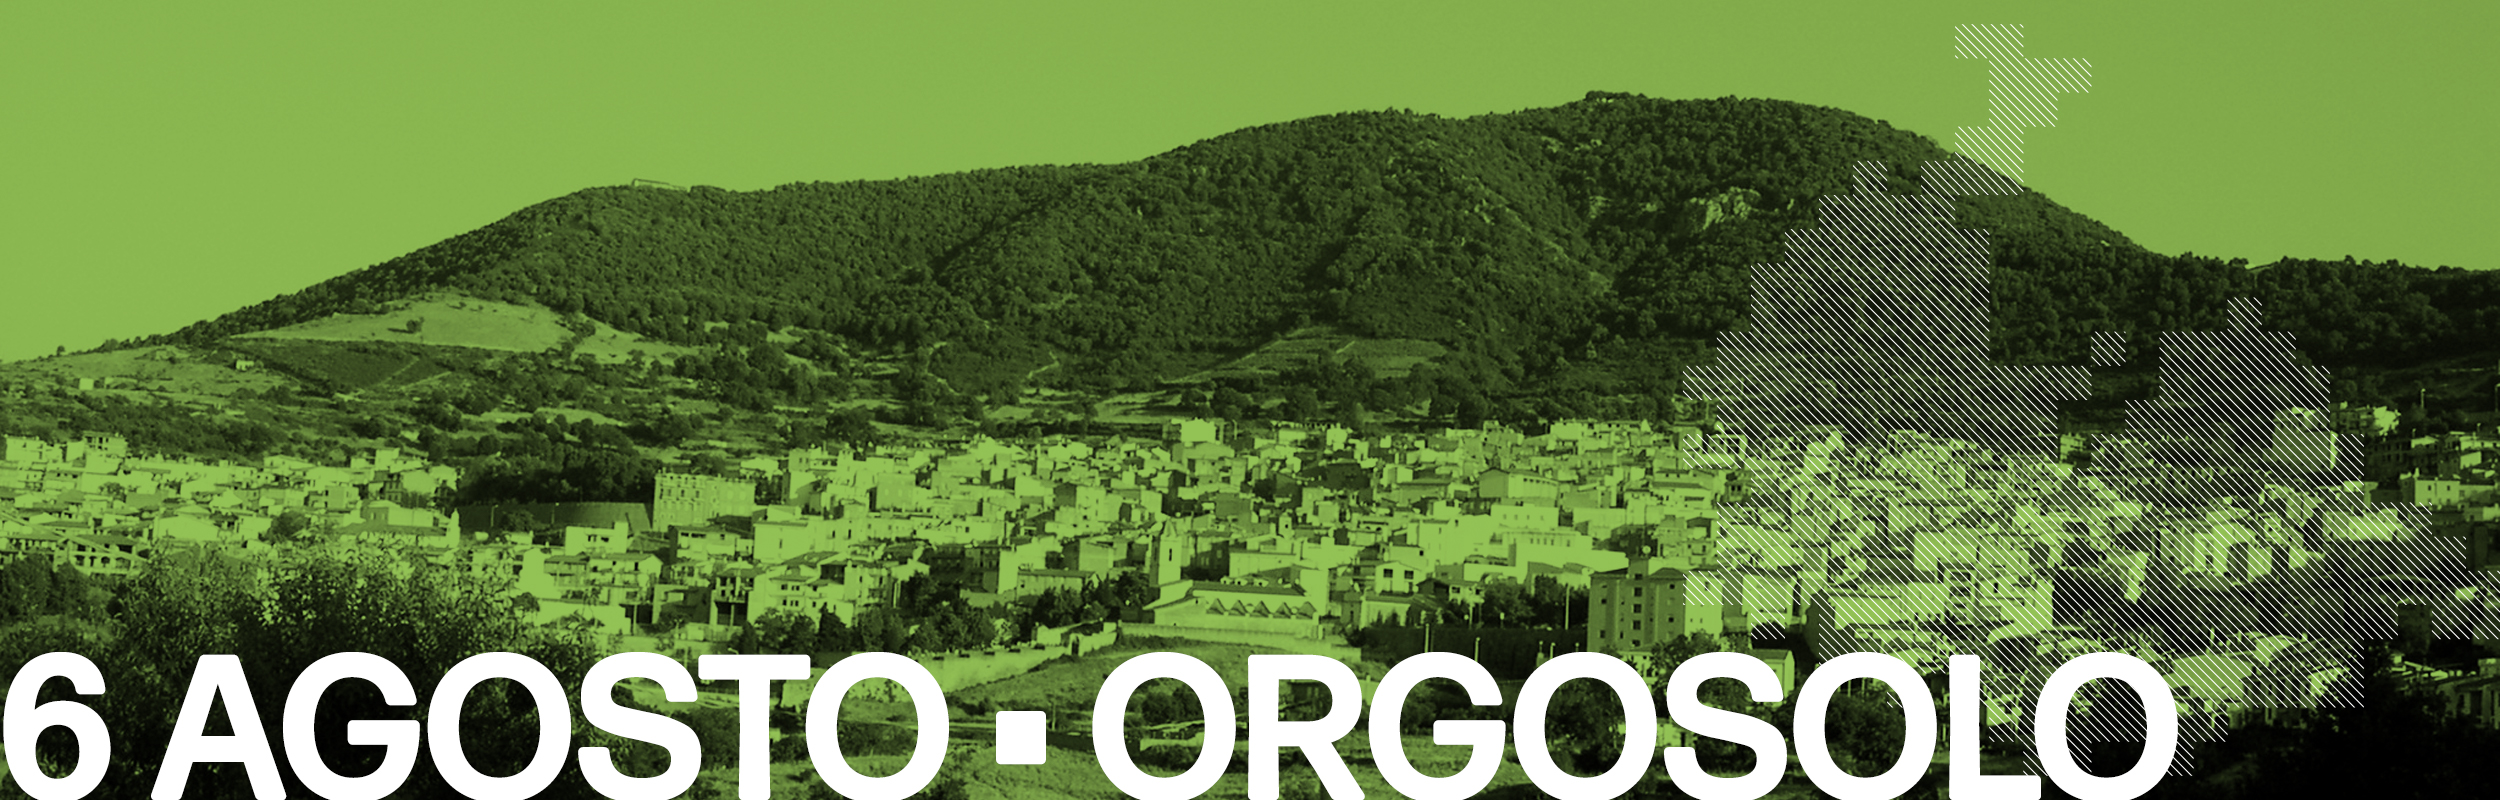 ORG-1